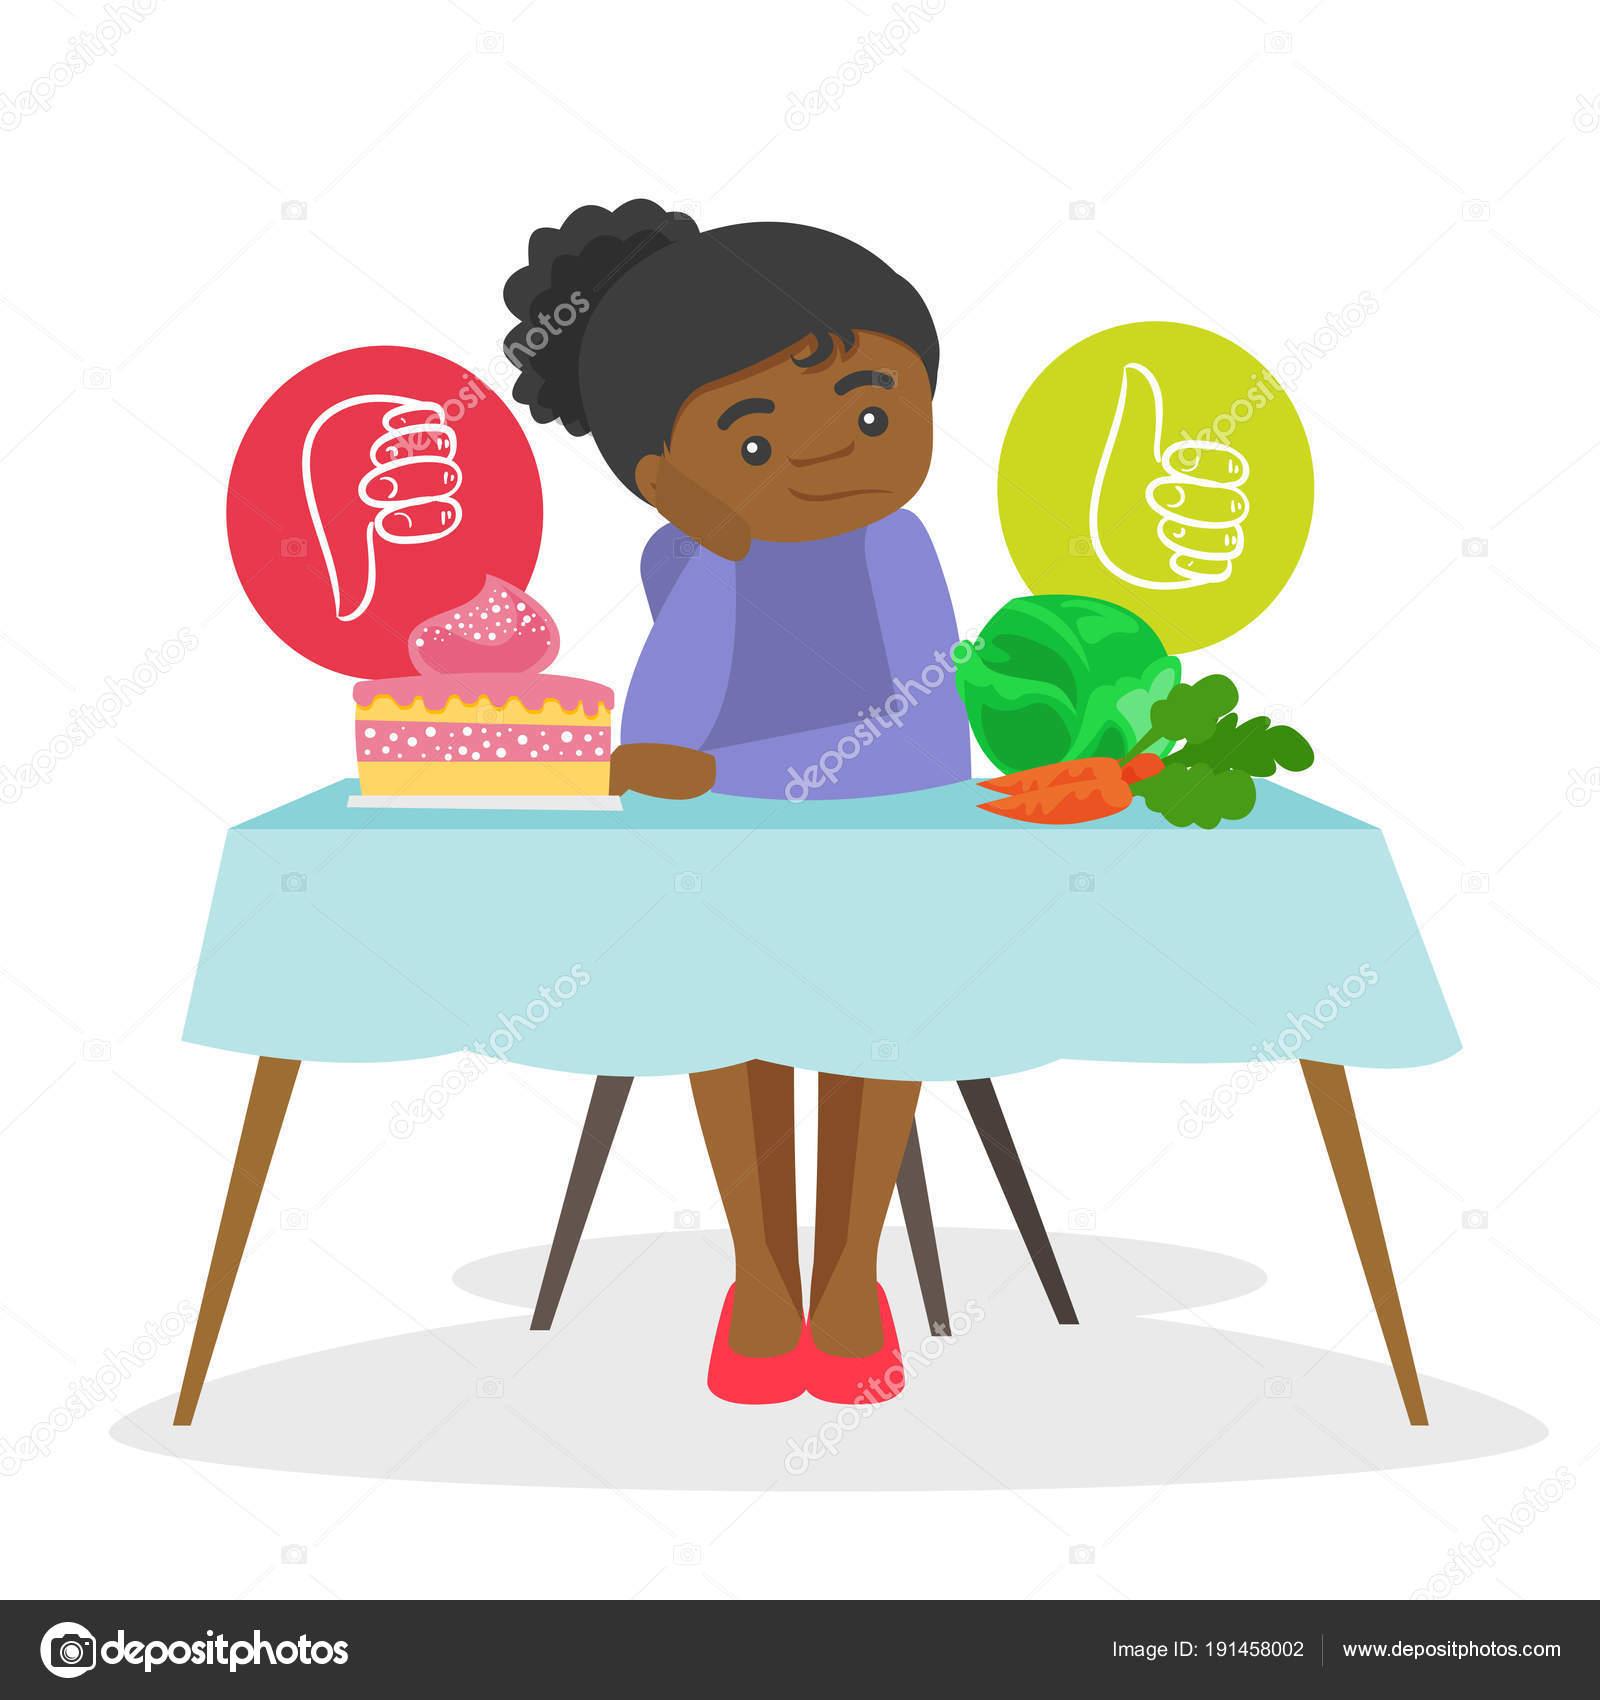 c363367f7f08 Αφρικανικός-αμερικανική γυναίκα που κάθεται στο τραπέζι και επιλέγοντας  ανάμεσα σε λαχανικά και των κέικ. Επιλογή μεταξύ των υγιών και μη υγιών  διατροφή ...